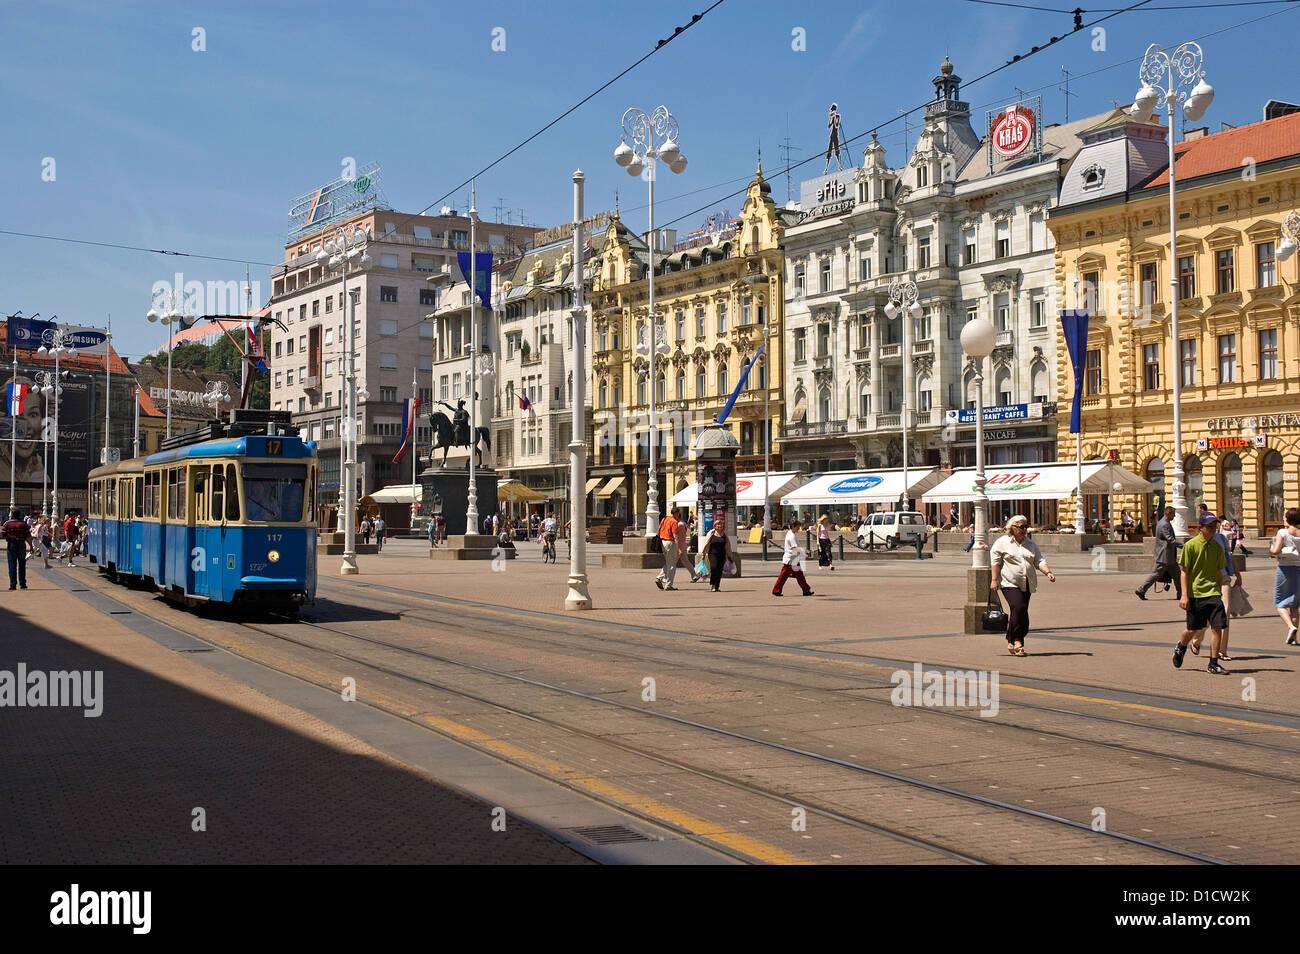 Elk192-1013 Croatia, Zagreb, Trg Josip Jelacica with streetcar Stock Photo